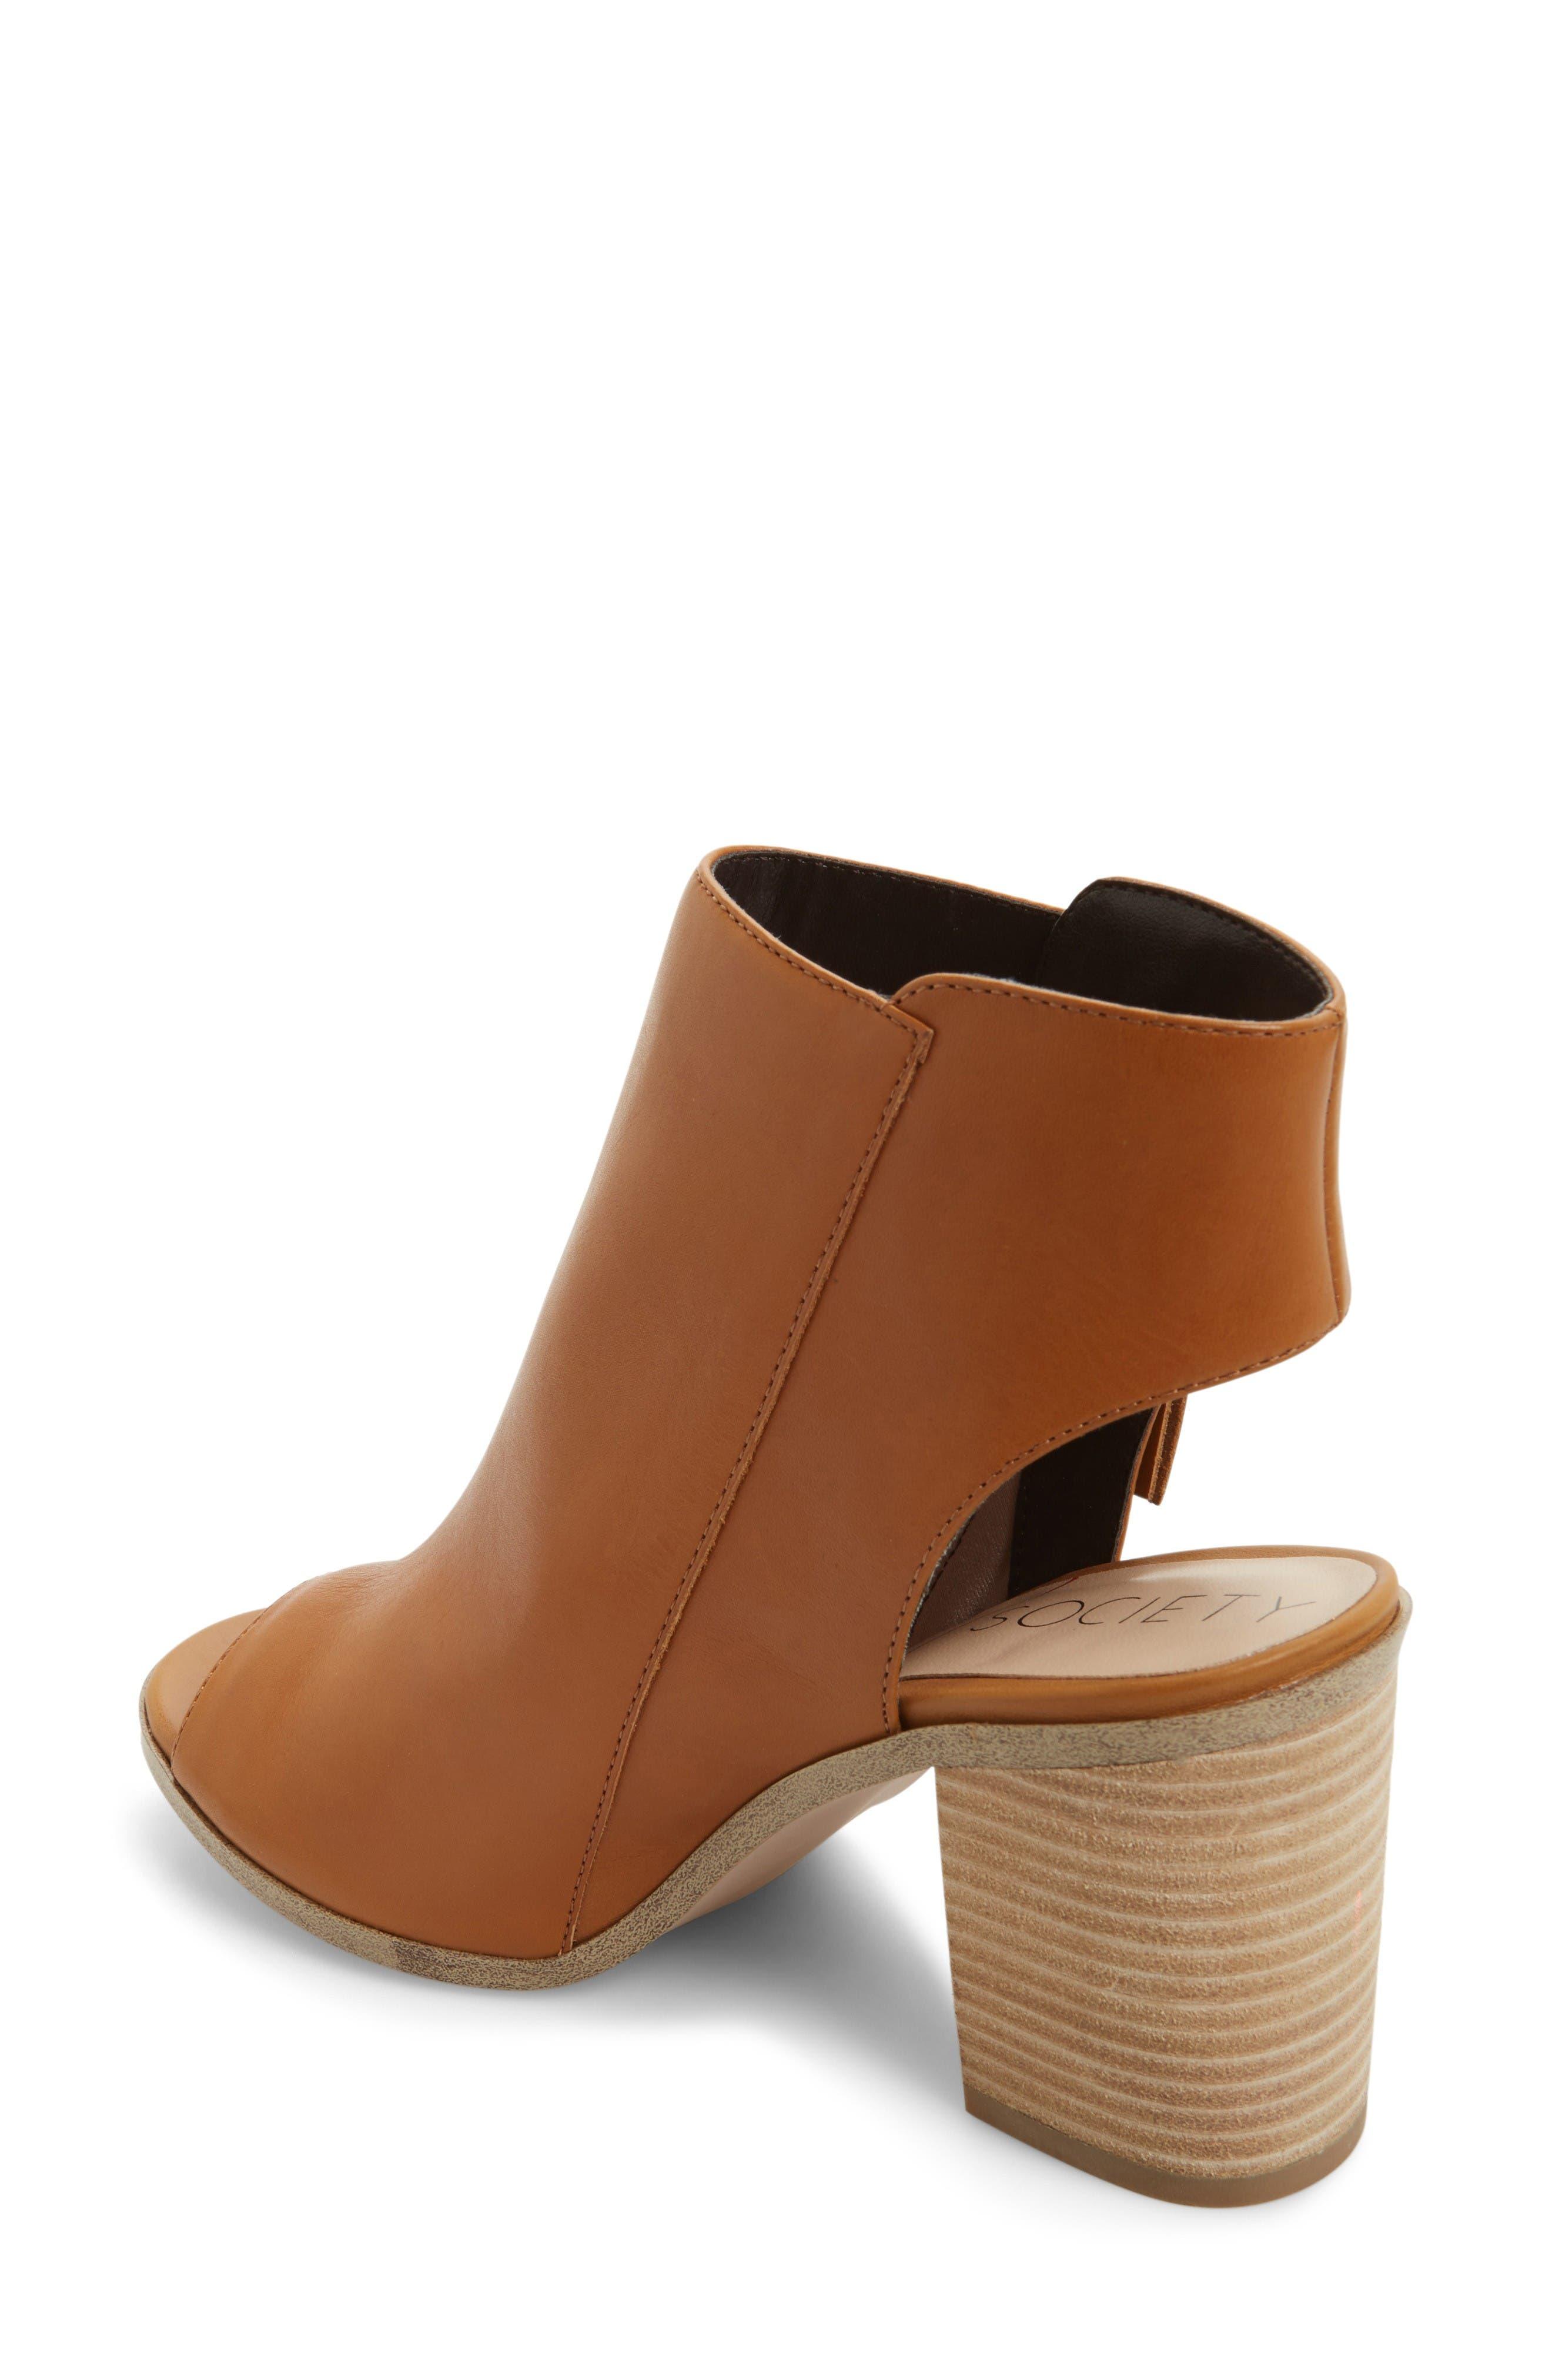 Alternate Image 2  - Sole Society Arizona Block Heel Peep-Toe Bootie (Women)